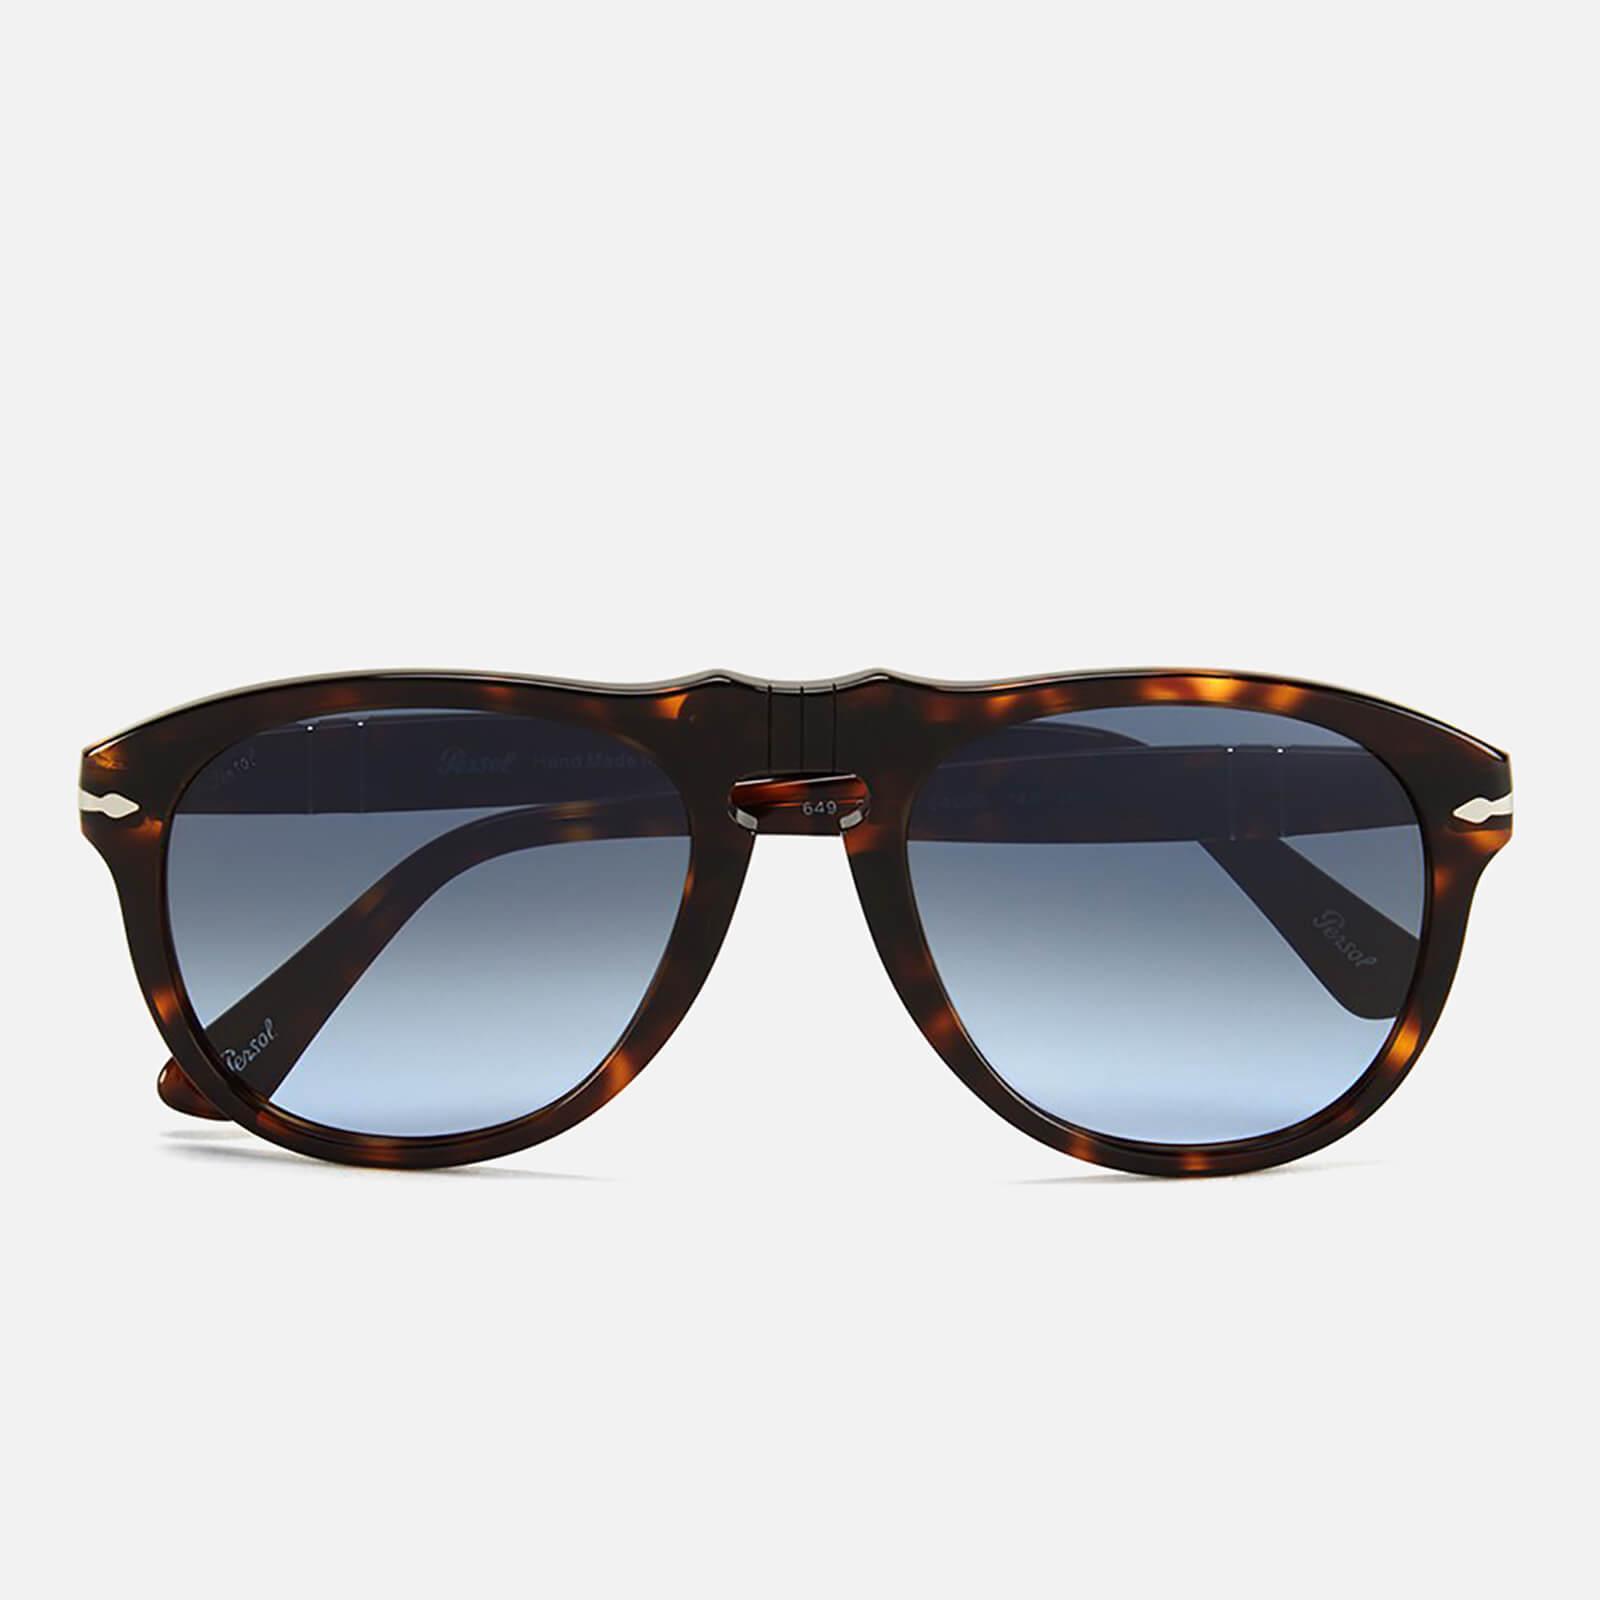 7dd87f1fc0a60 Persol D-Frame Men s Sunglasses - Havana with Sky Lenses - Free UK ...